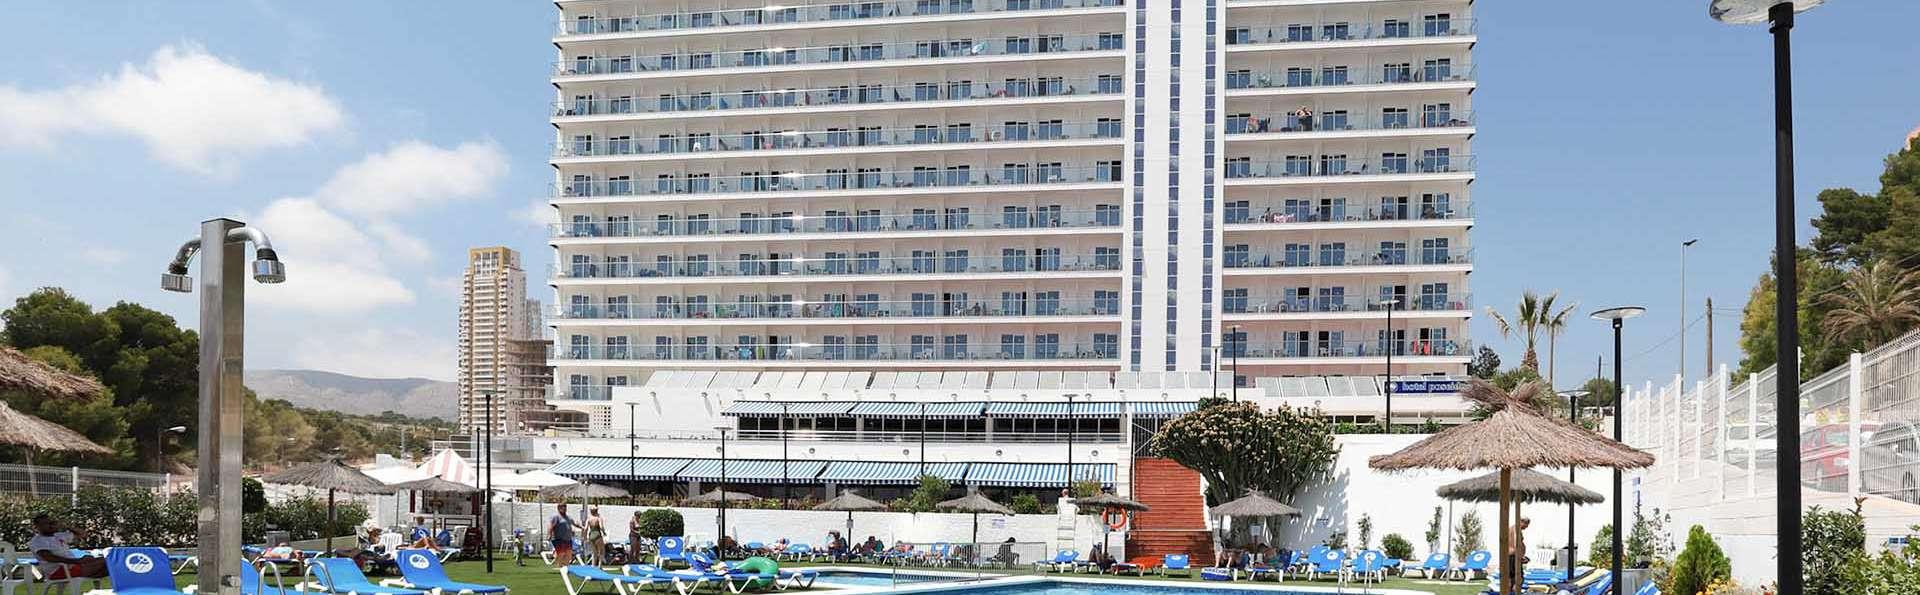 Hotel Poseidon Playa - EDIT_POOL_01.jpg